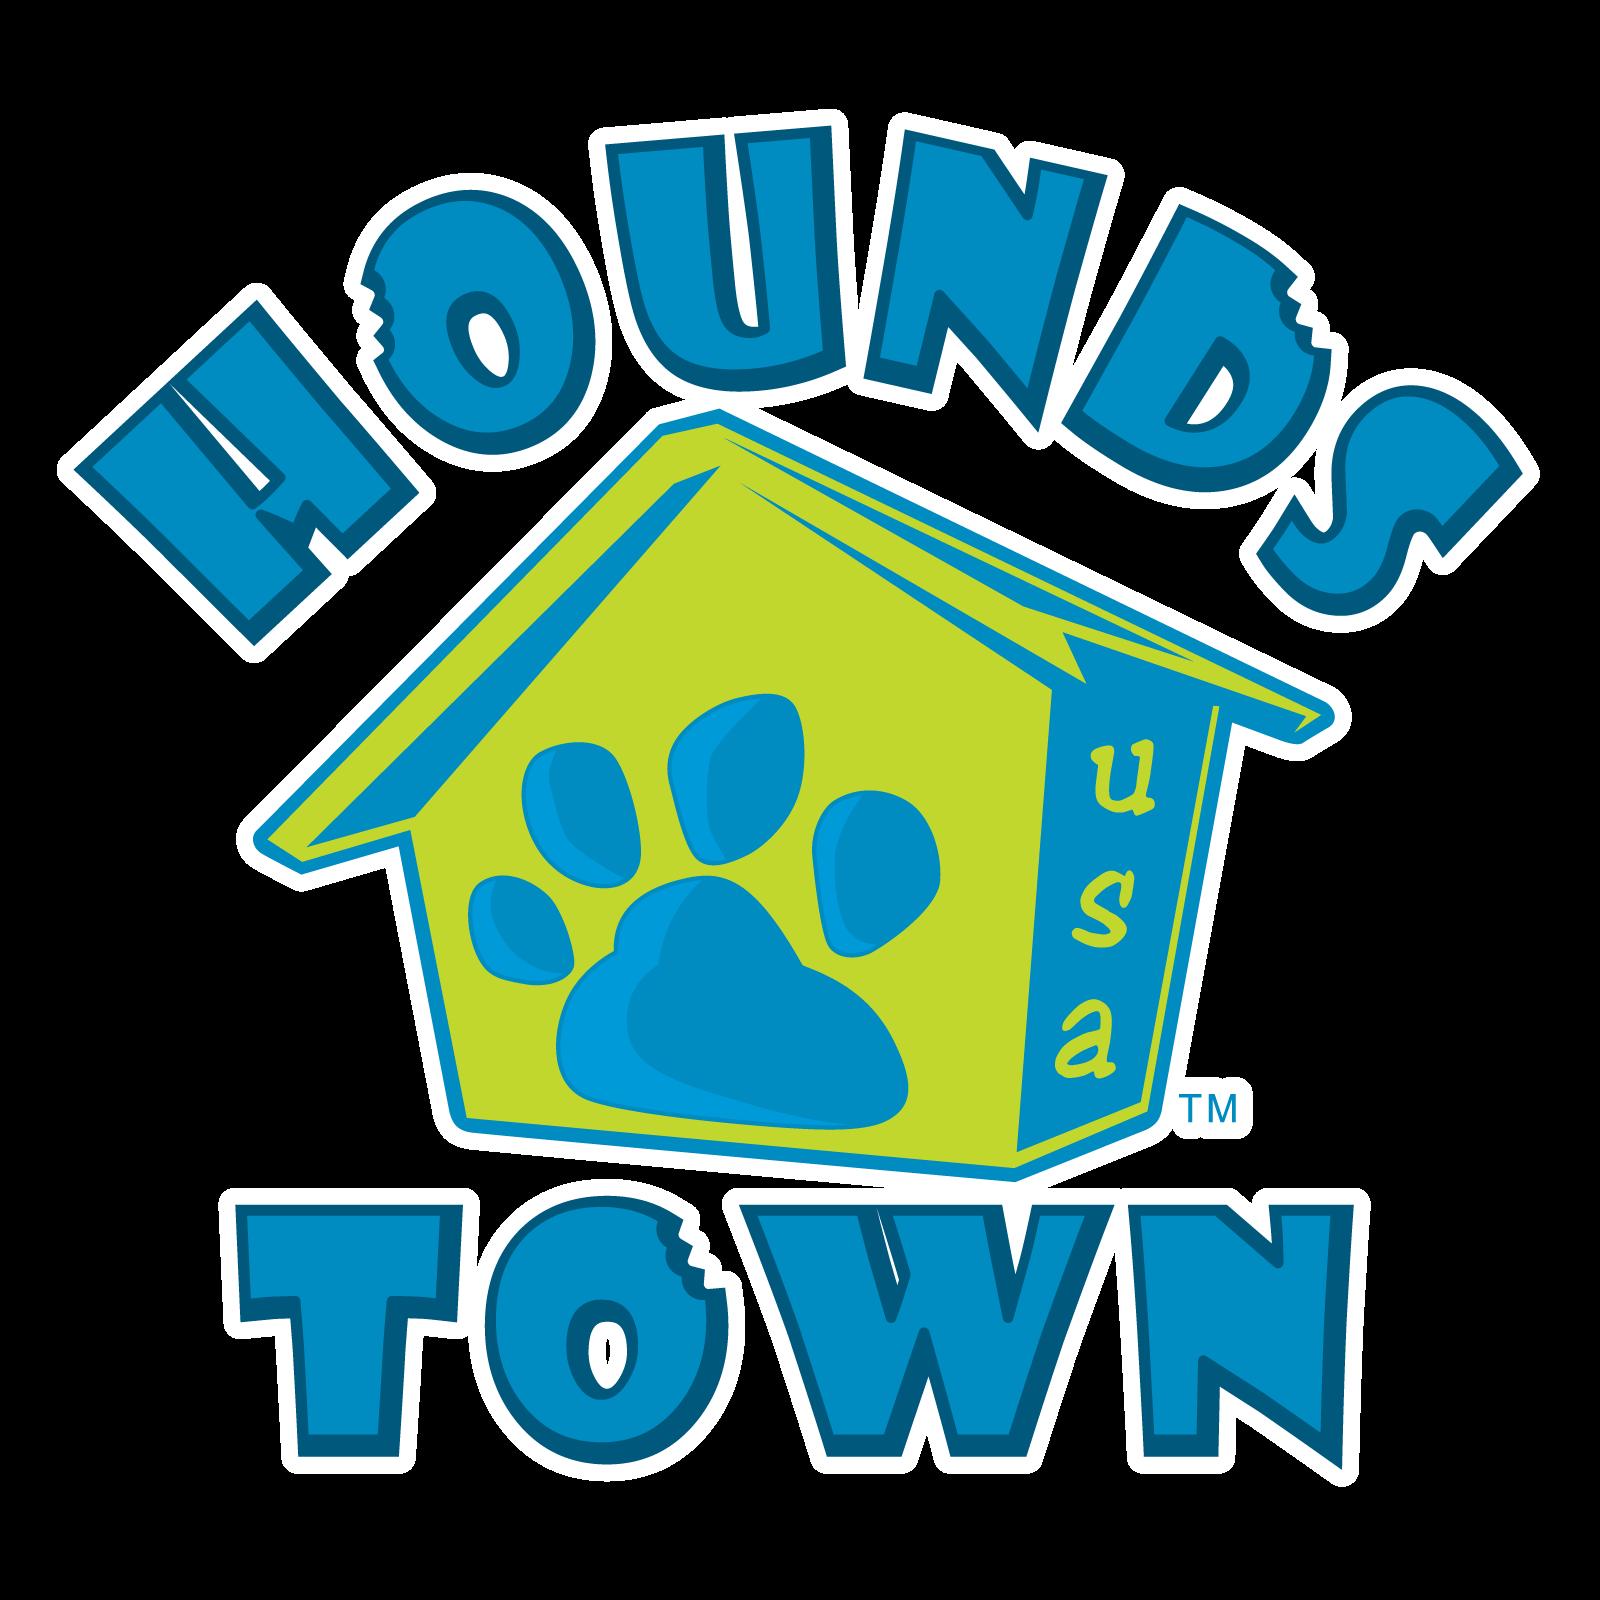 Sponsor Hounds Town USA